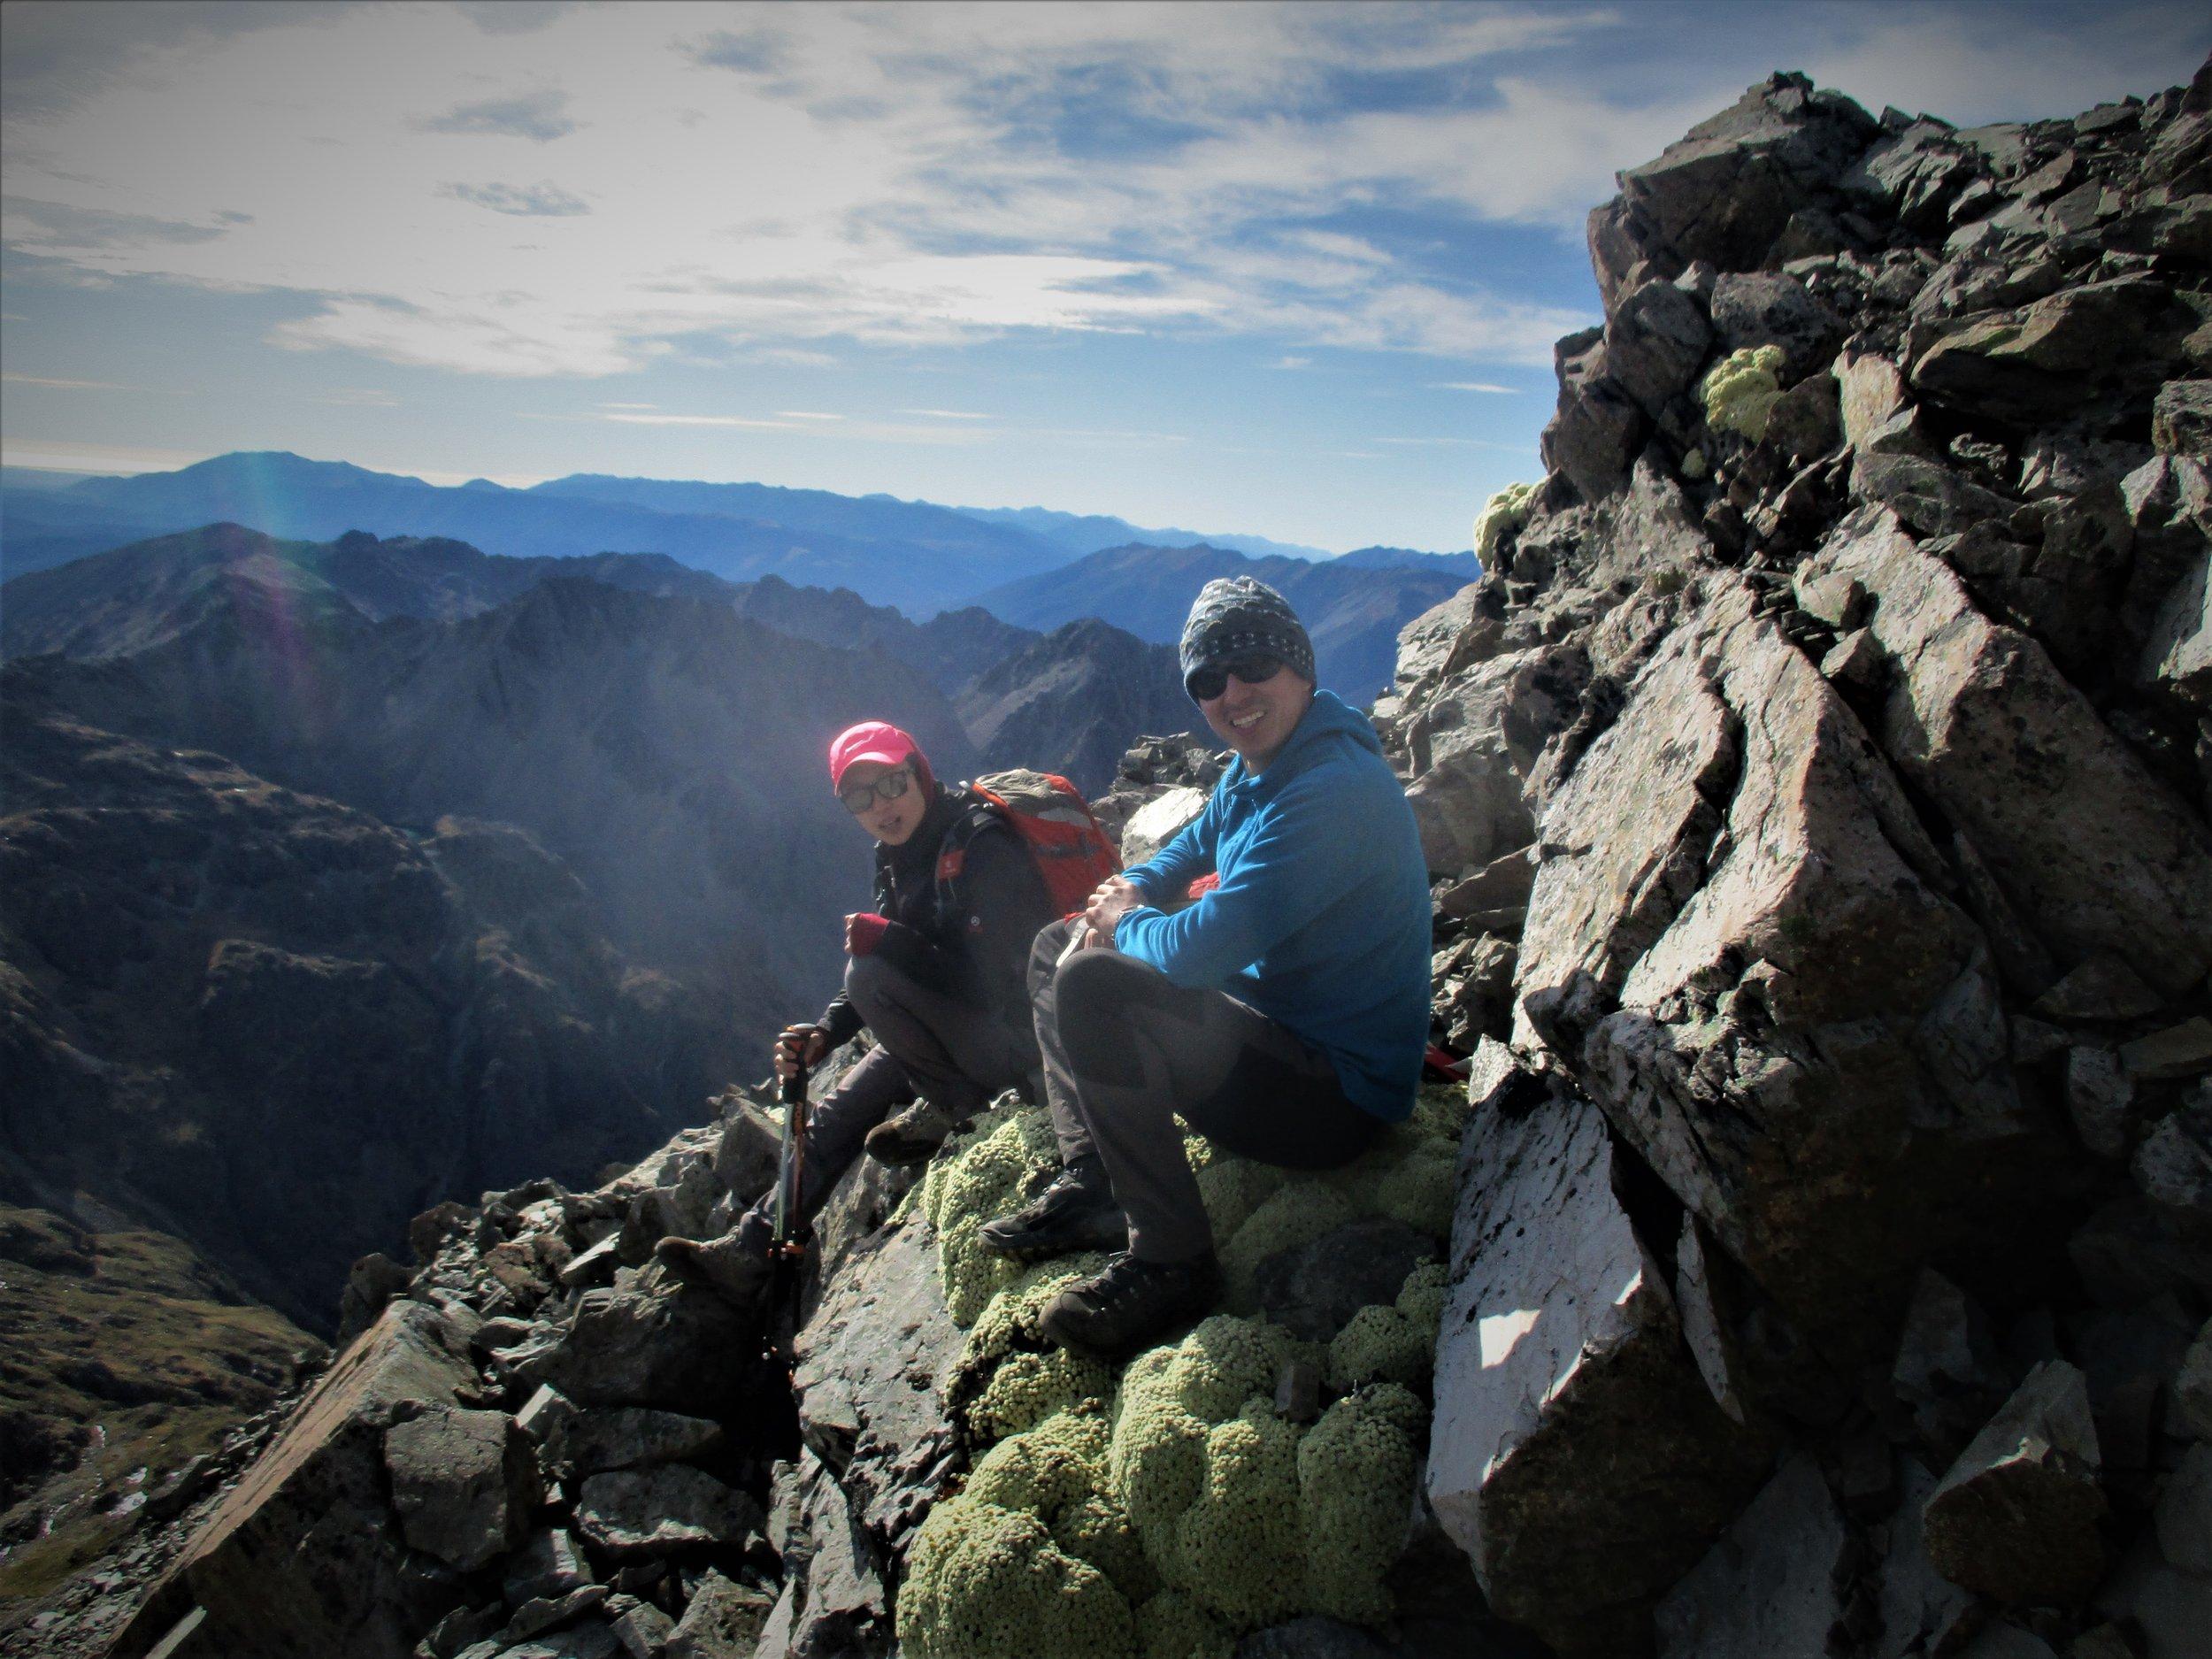 Meetig Sergio and Mei near the summit of Angelus